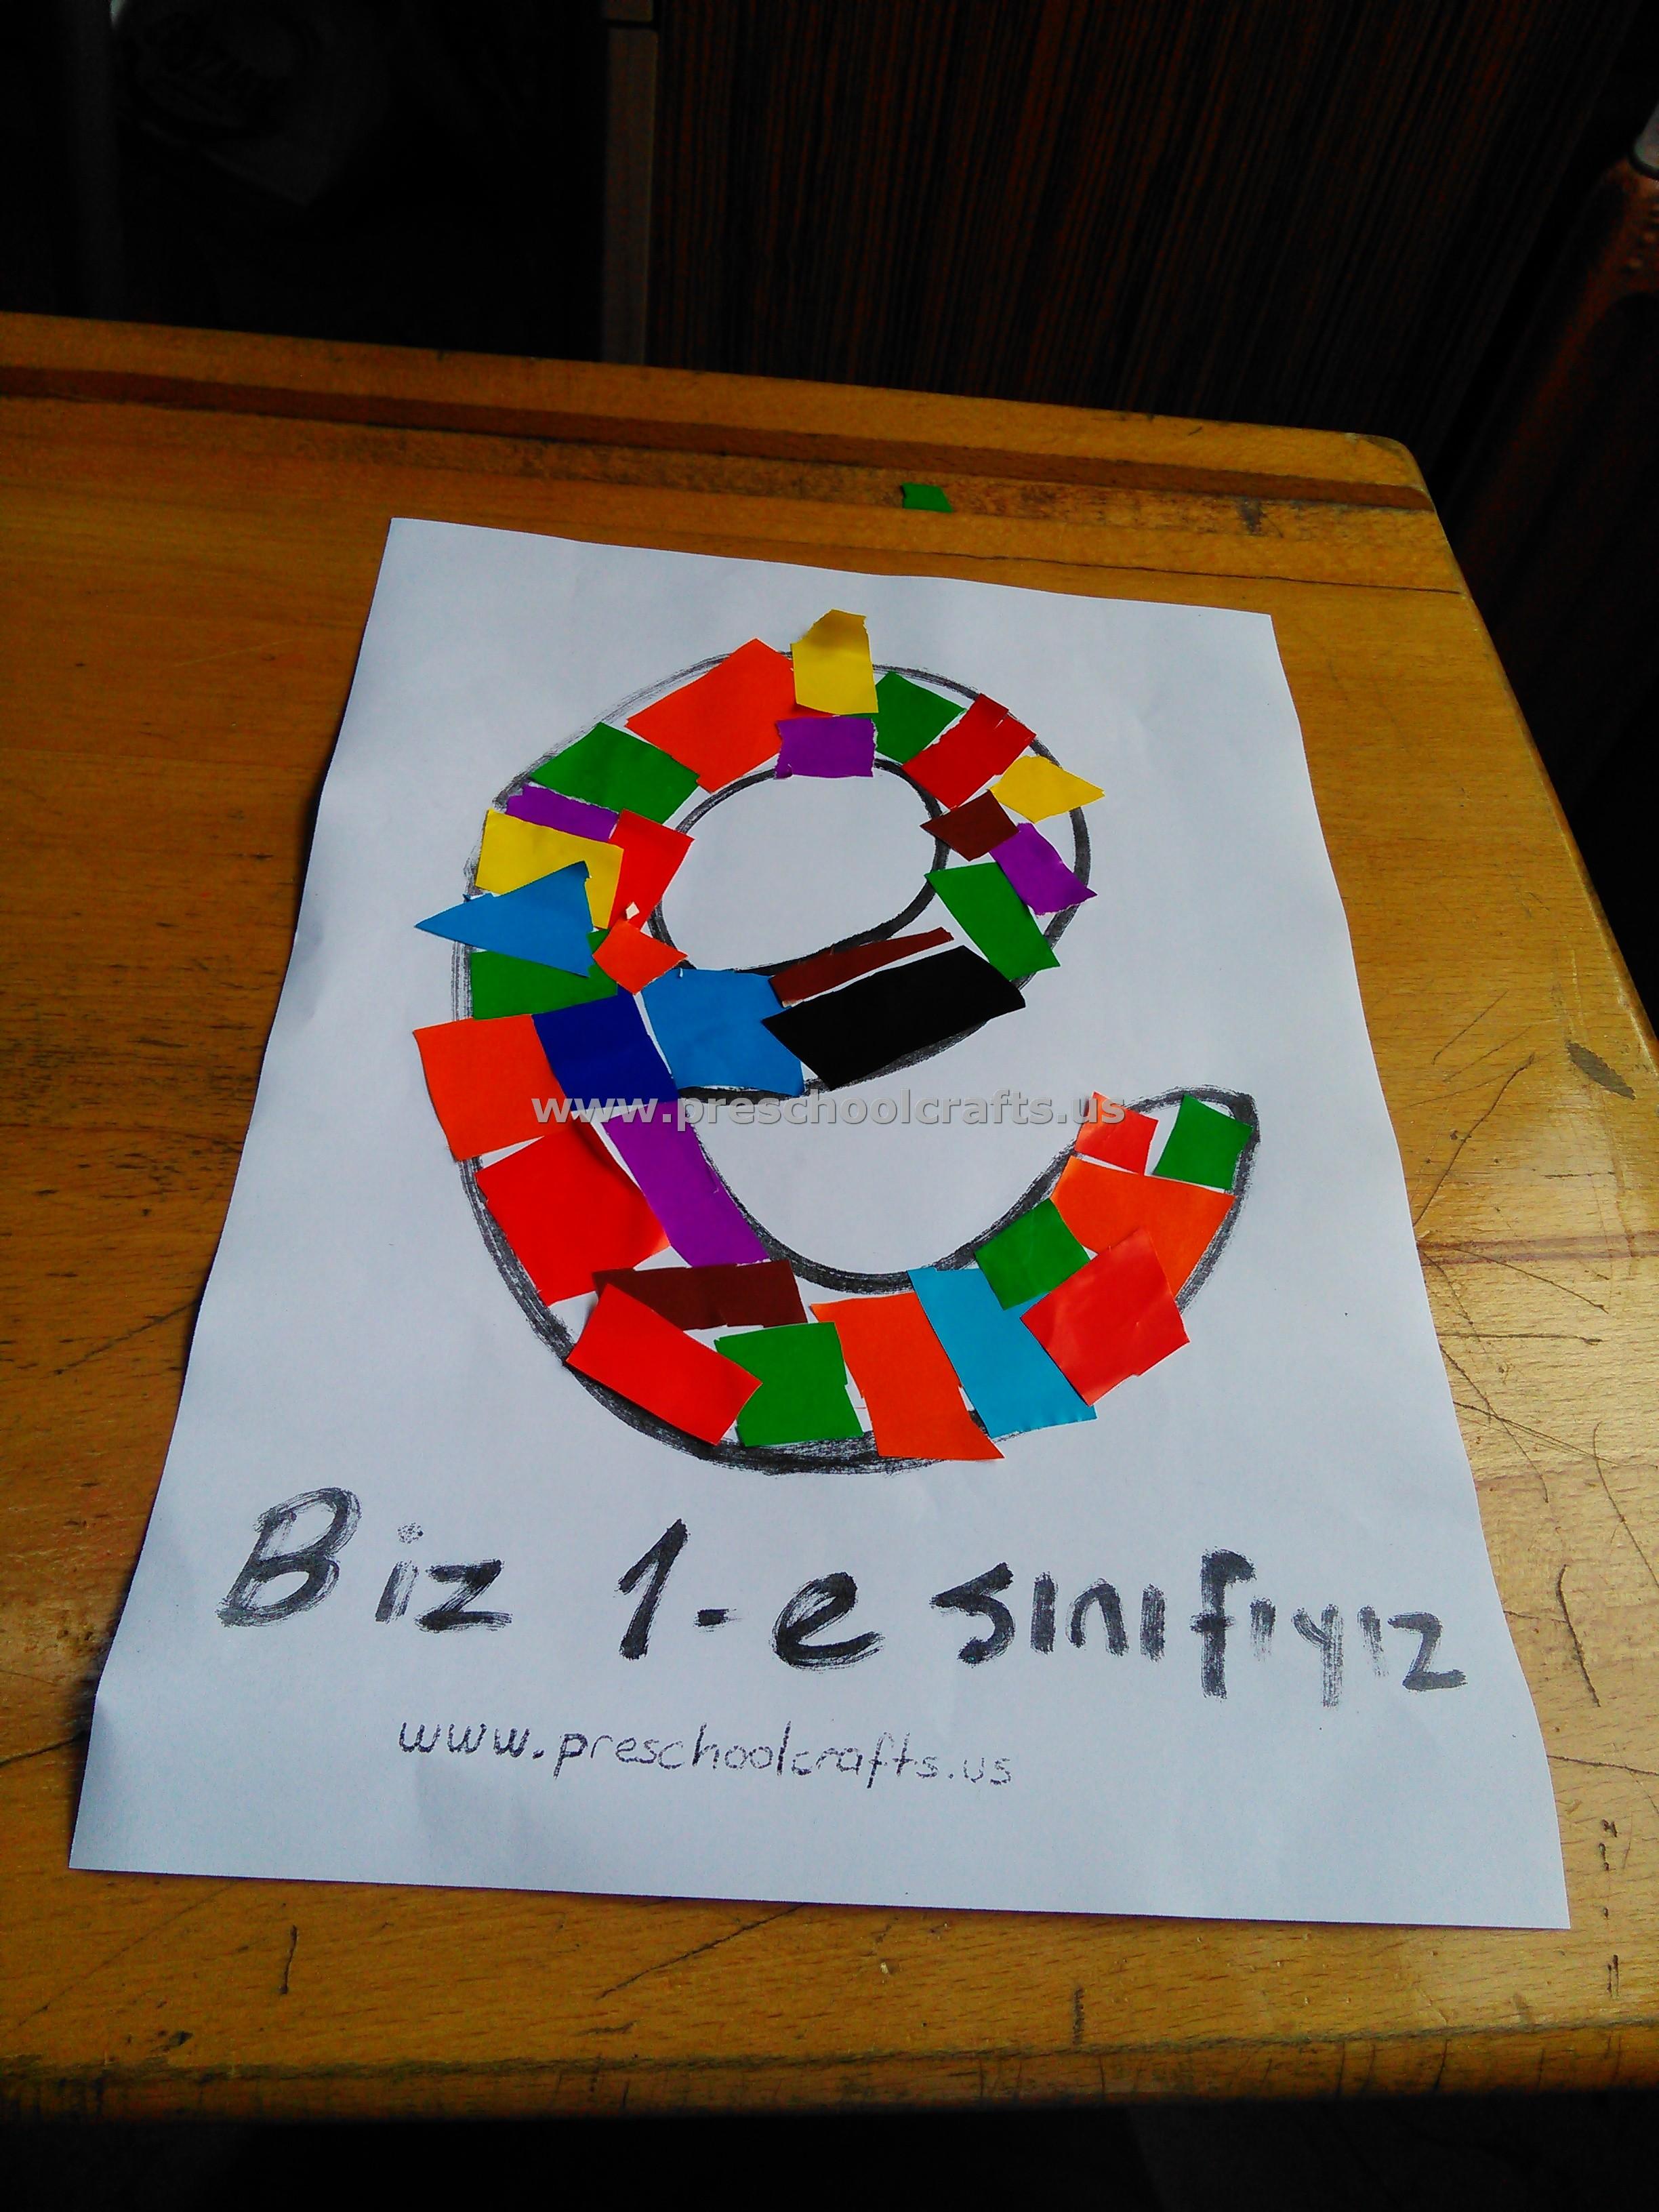 Letter E Crafts For Preschool And Kindergarten Preschool Crafts